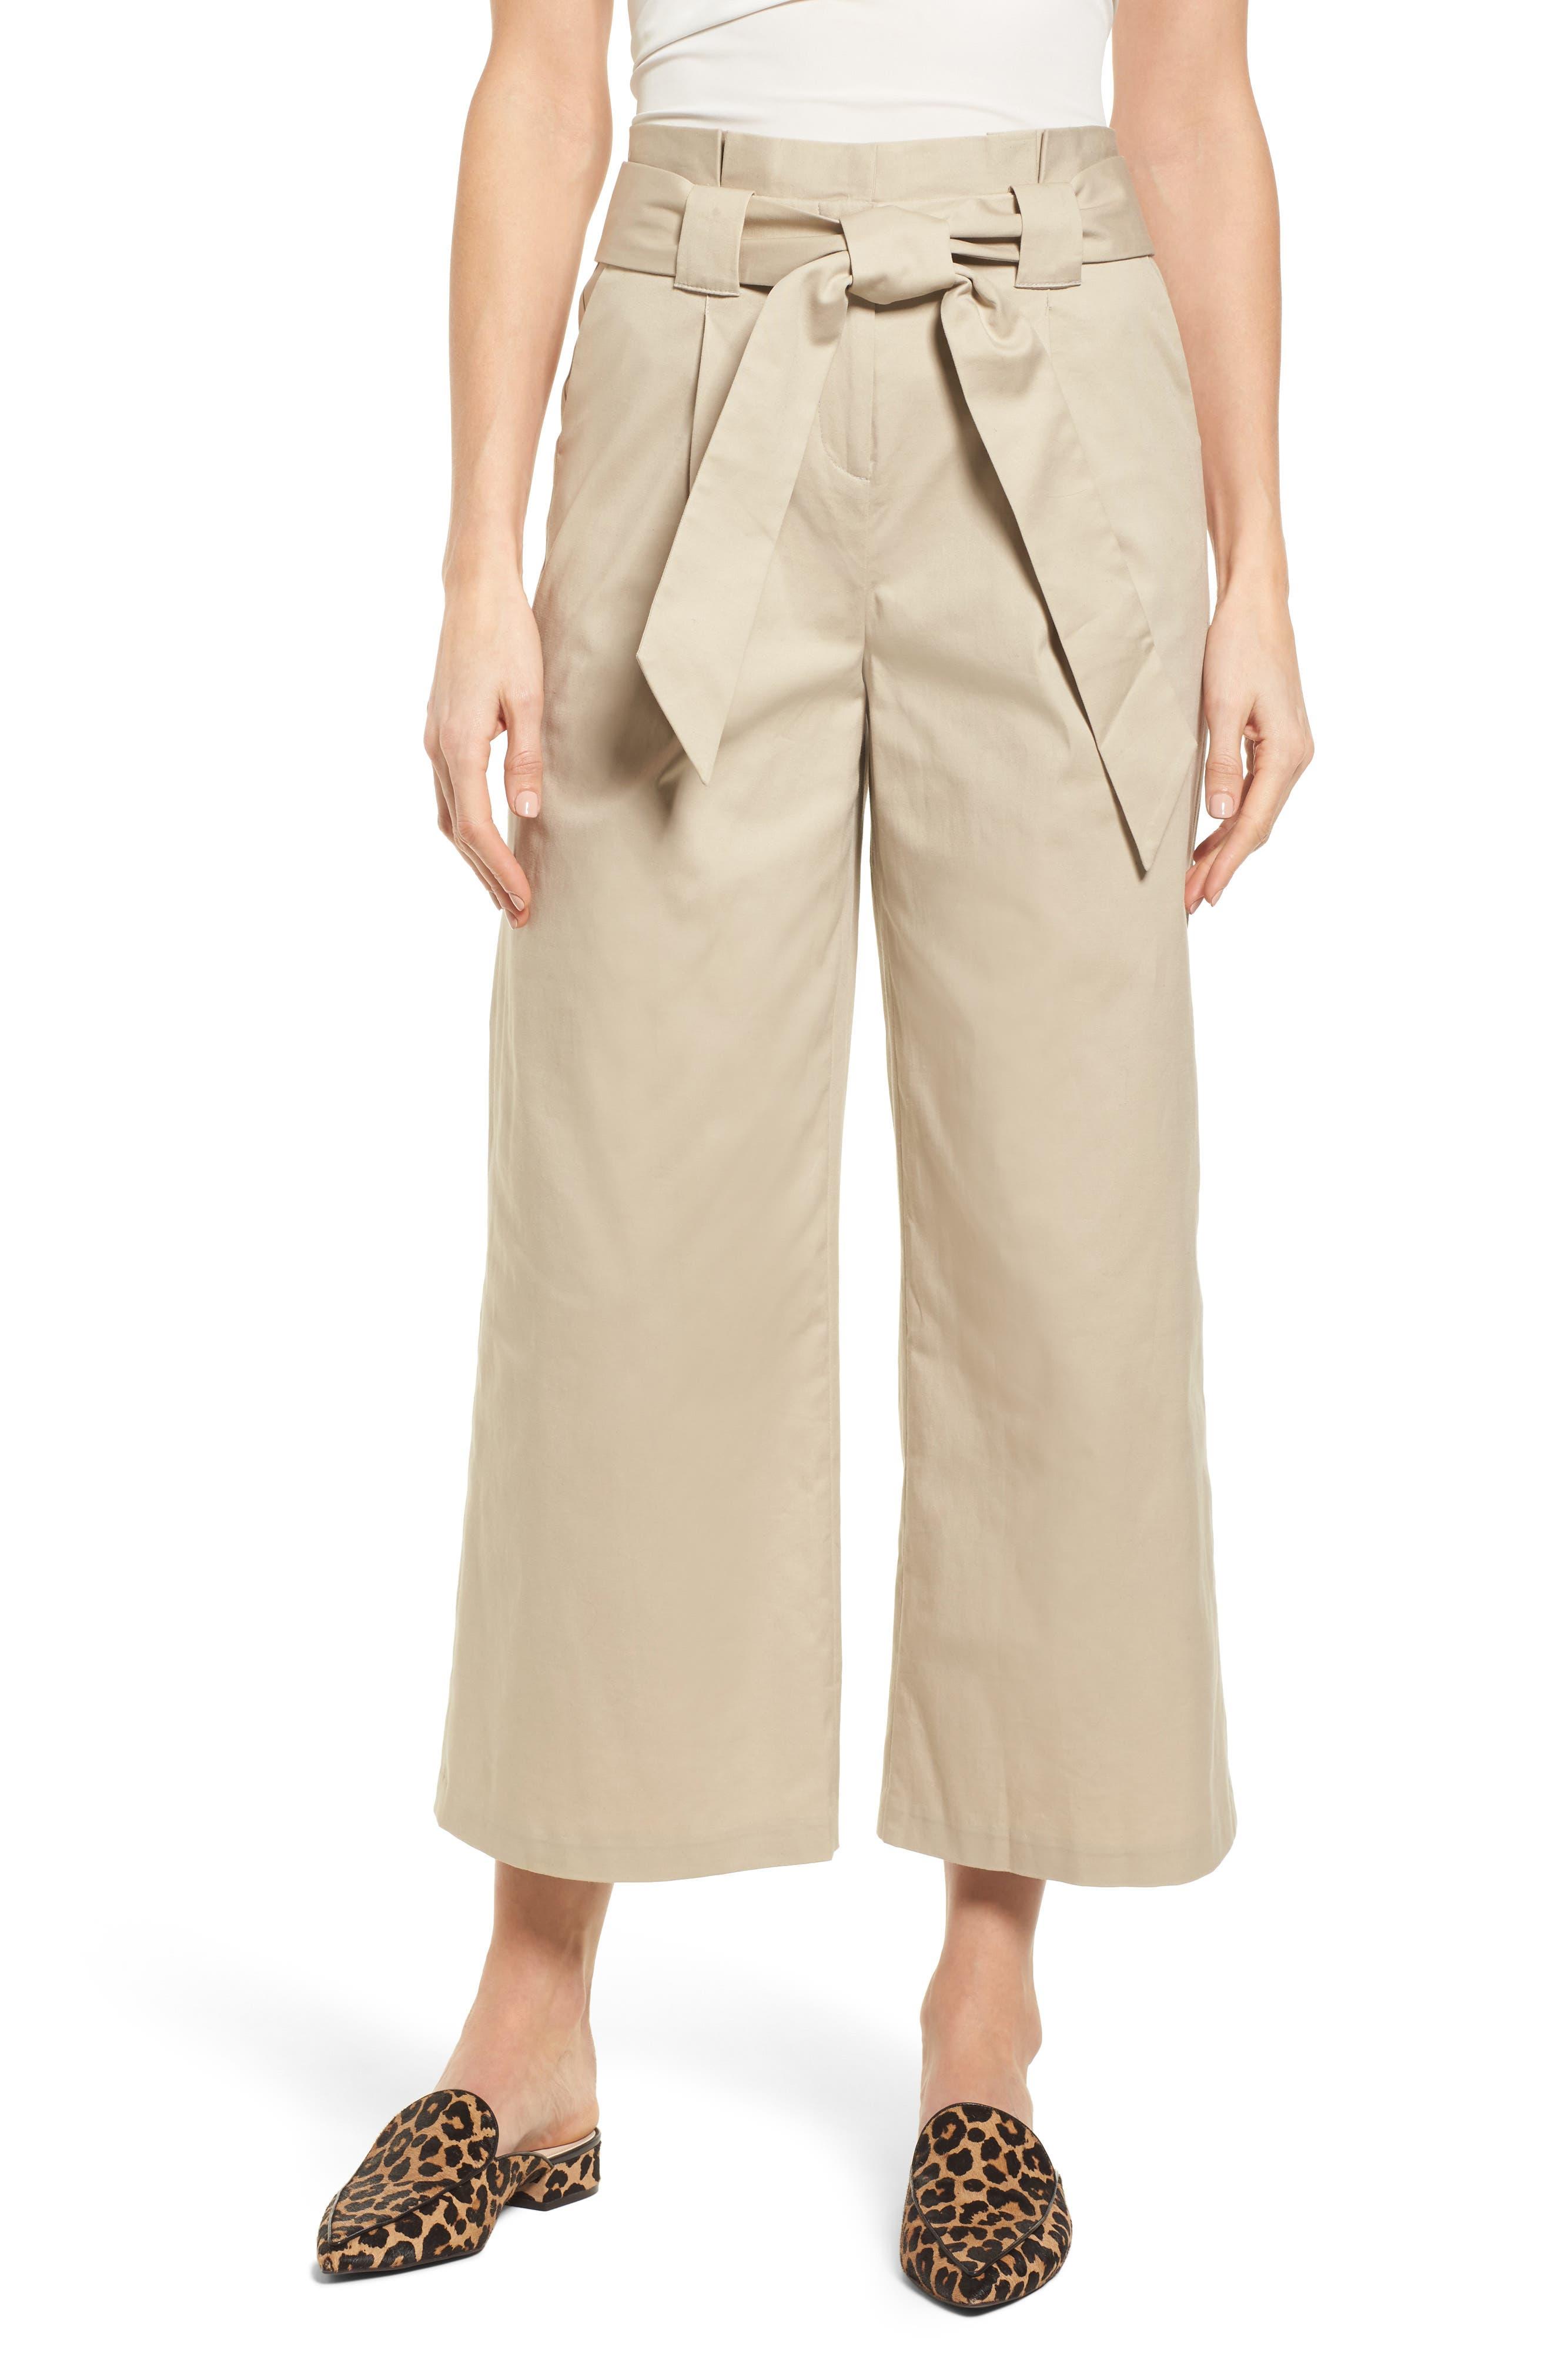 Paperbag Waist Belted Wide Leg Crop Pants,                             Main thumbnail 1, color,                             Tan Oxford